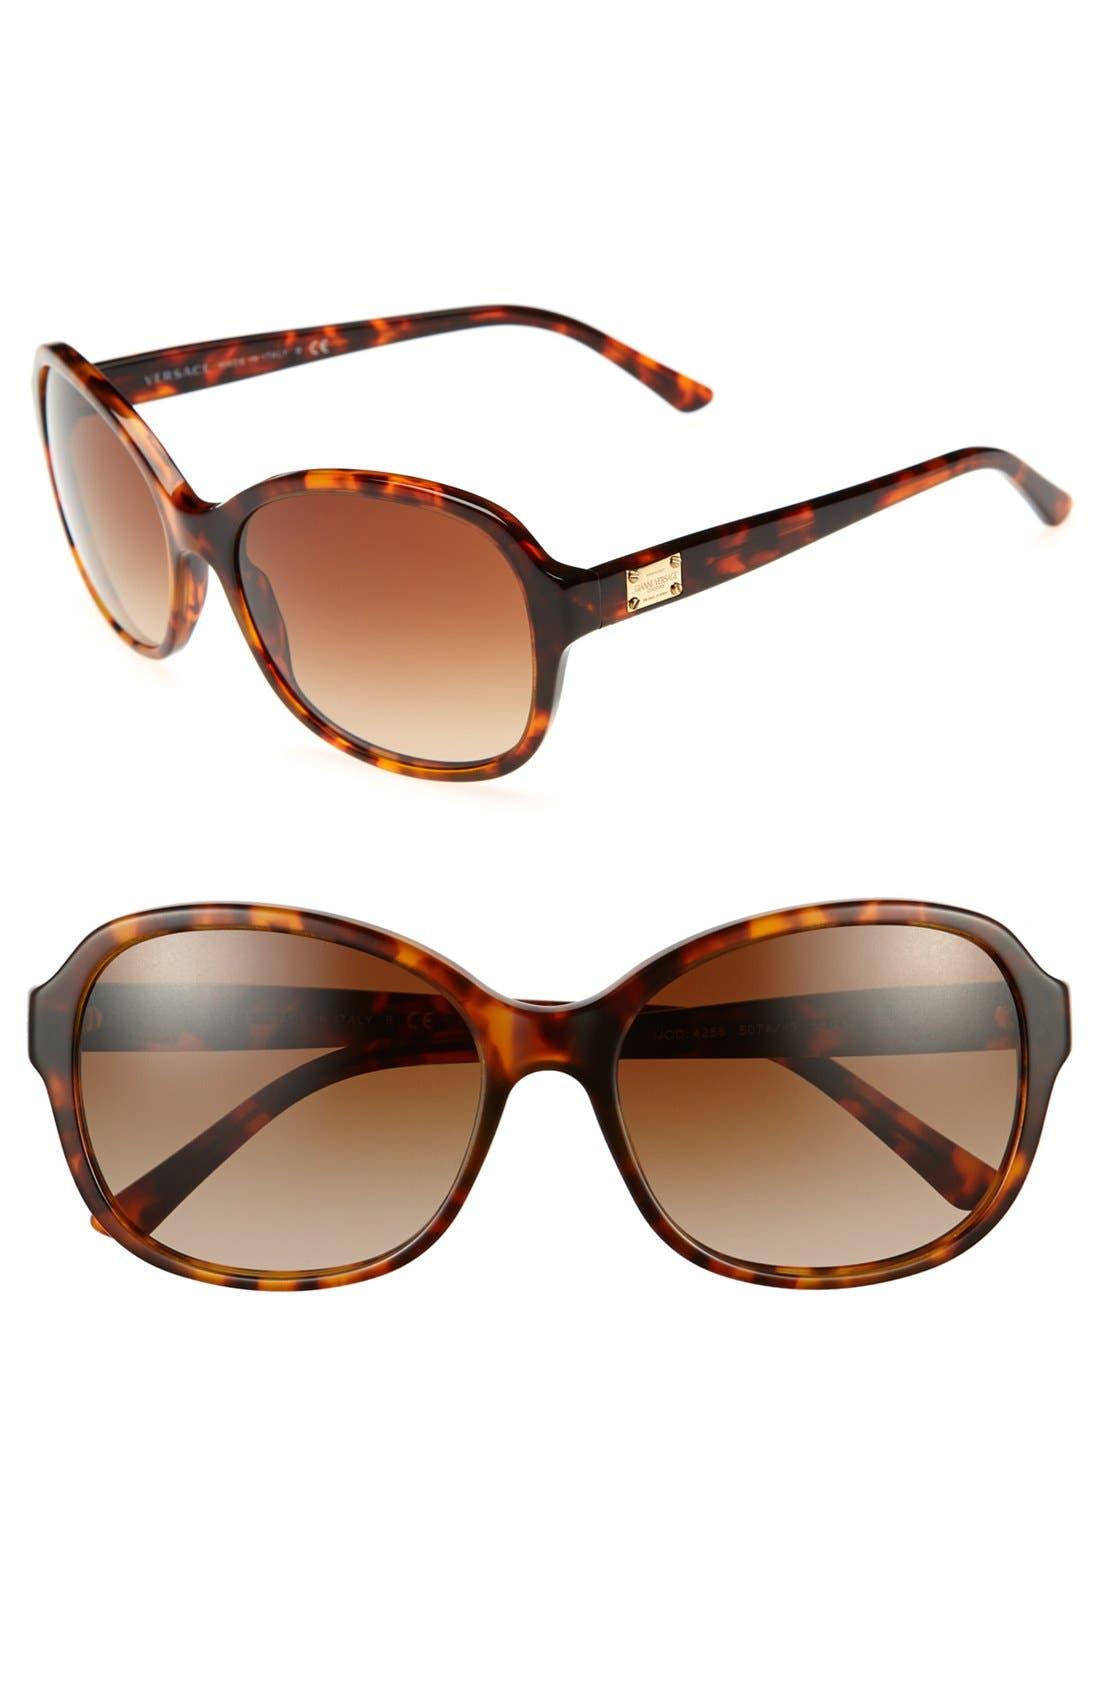 Alternate Image 1 Selected - Versace 'Pop Chic Culture' 58mm Sunglasses